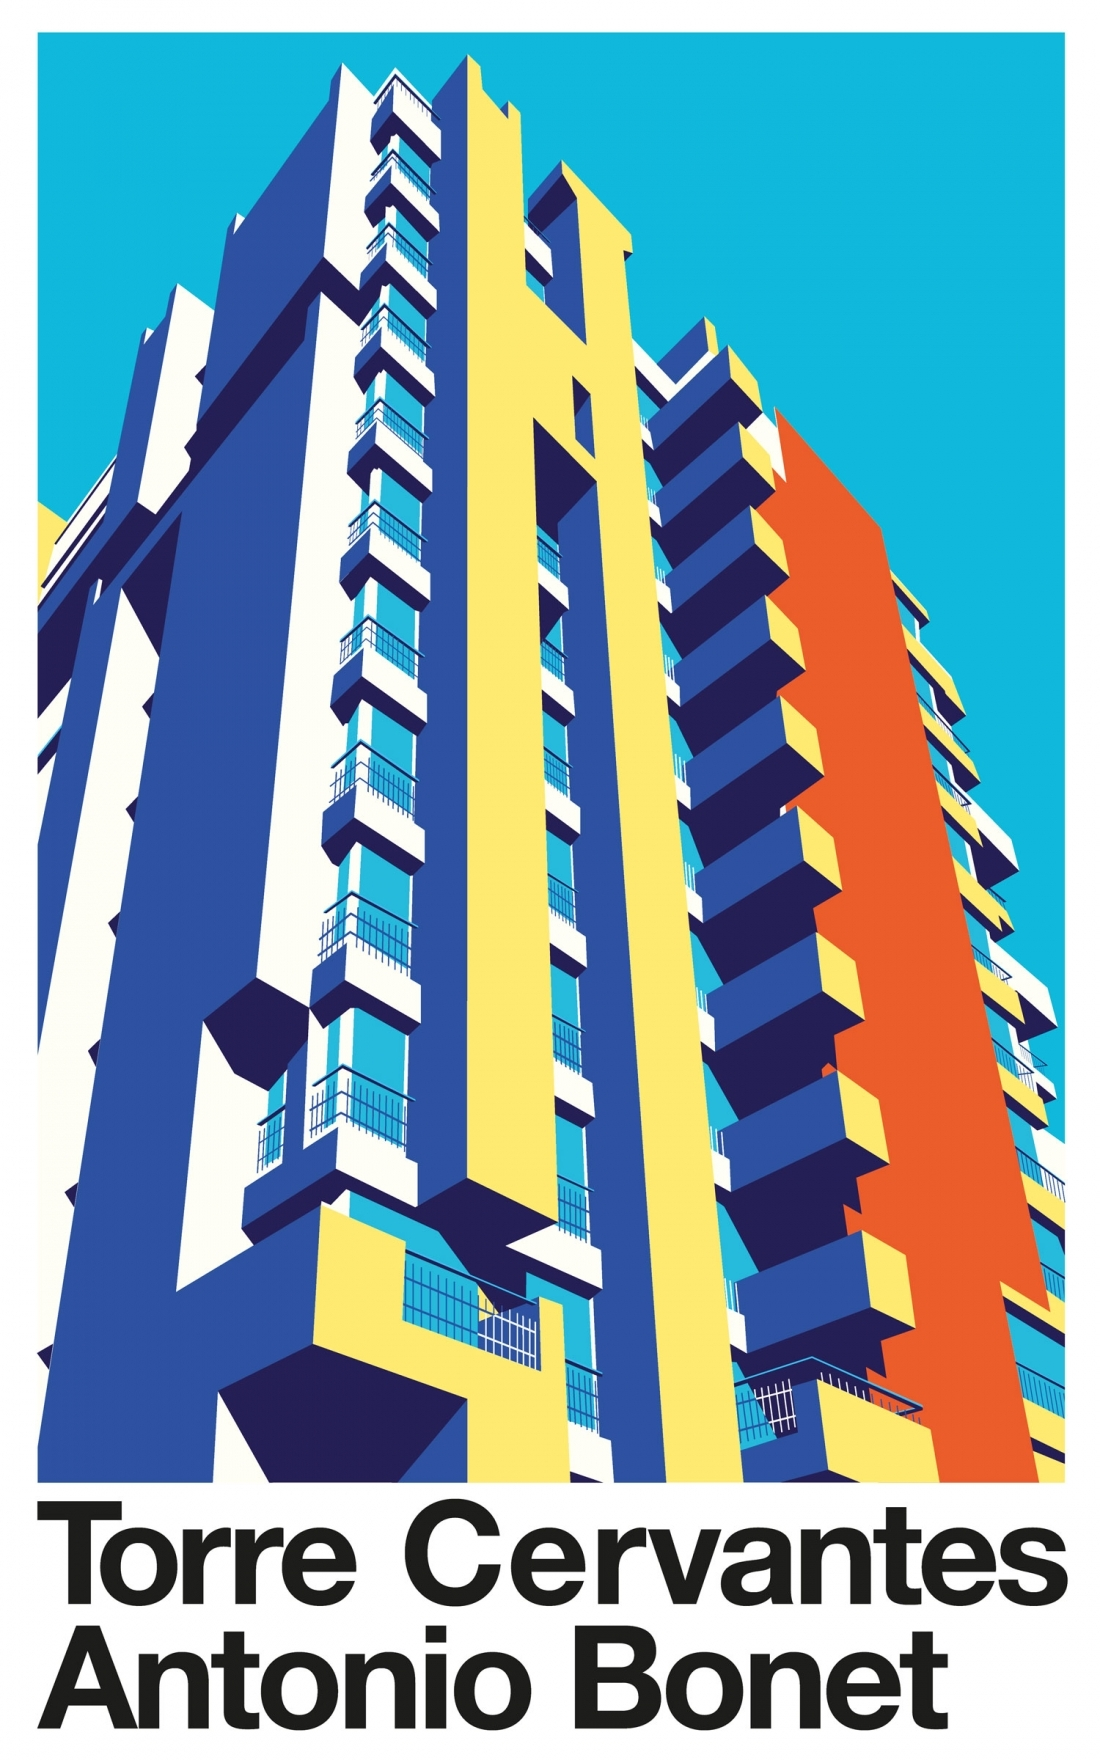 Splendid colourful illustration - benim_jbweb | ello